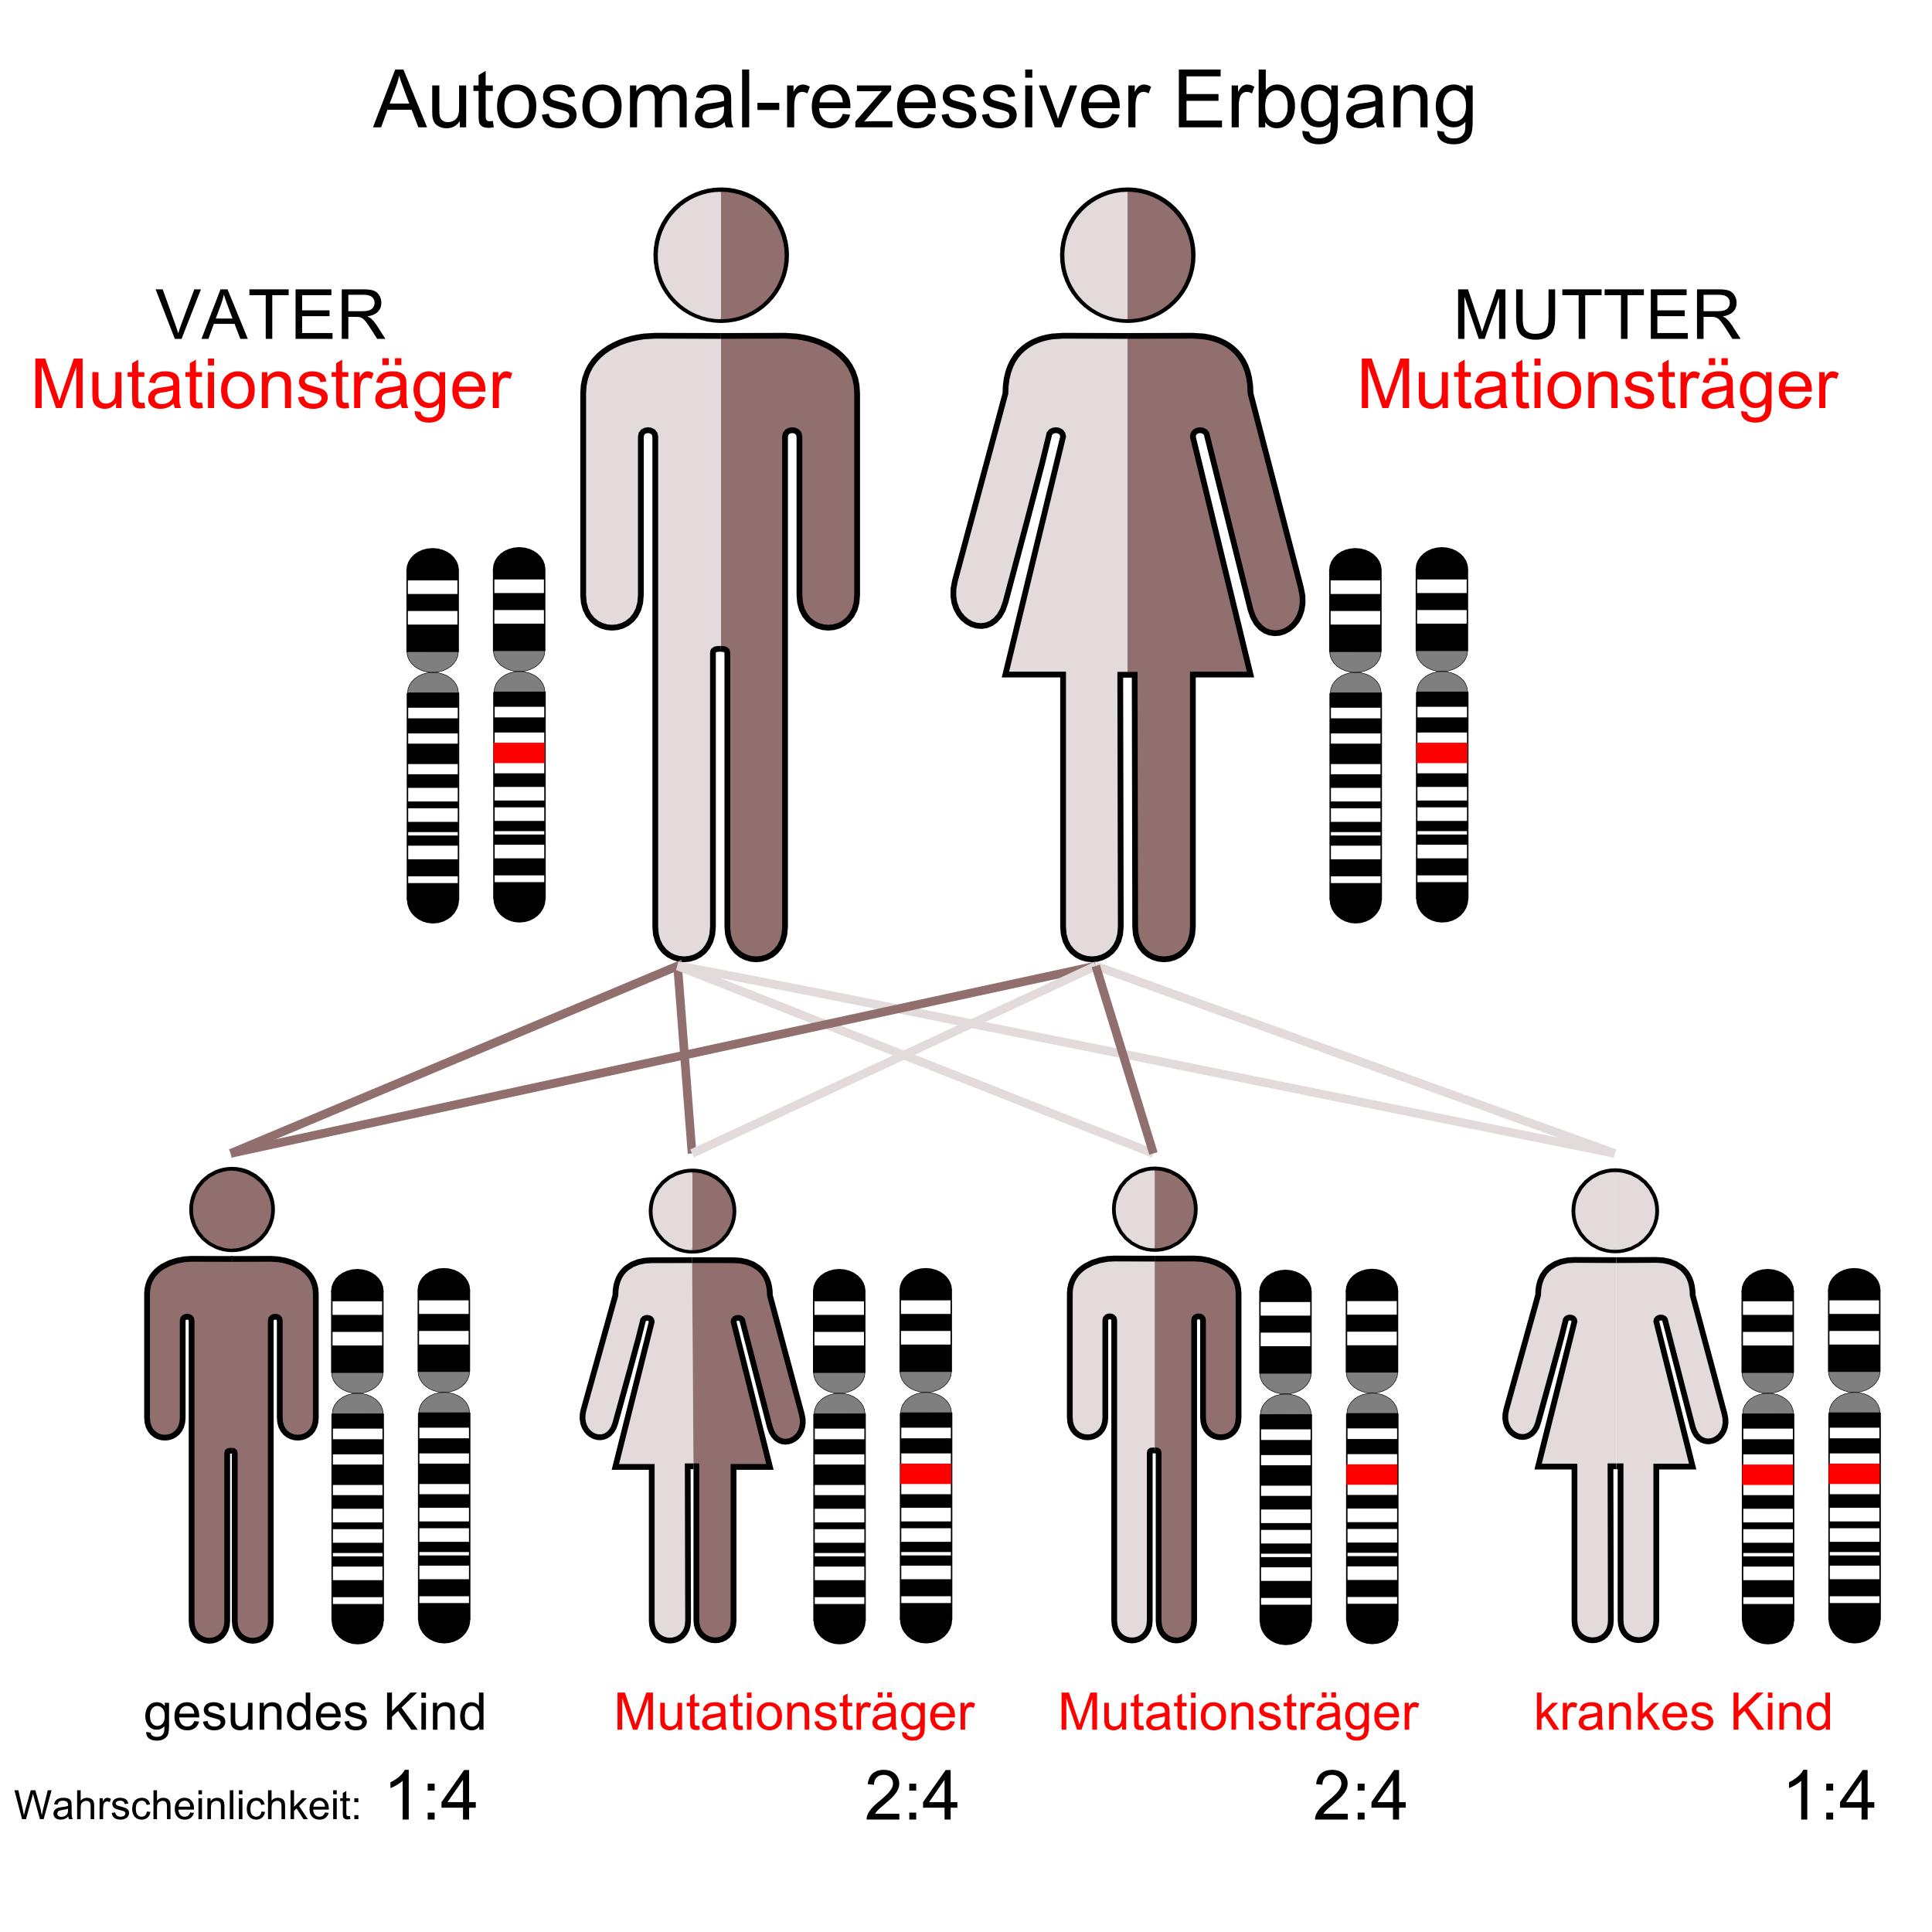 Autosomal Rezessiv und Dominant (Schule, Biologie, Genetik)